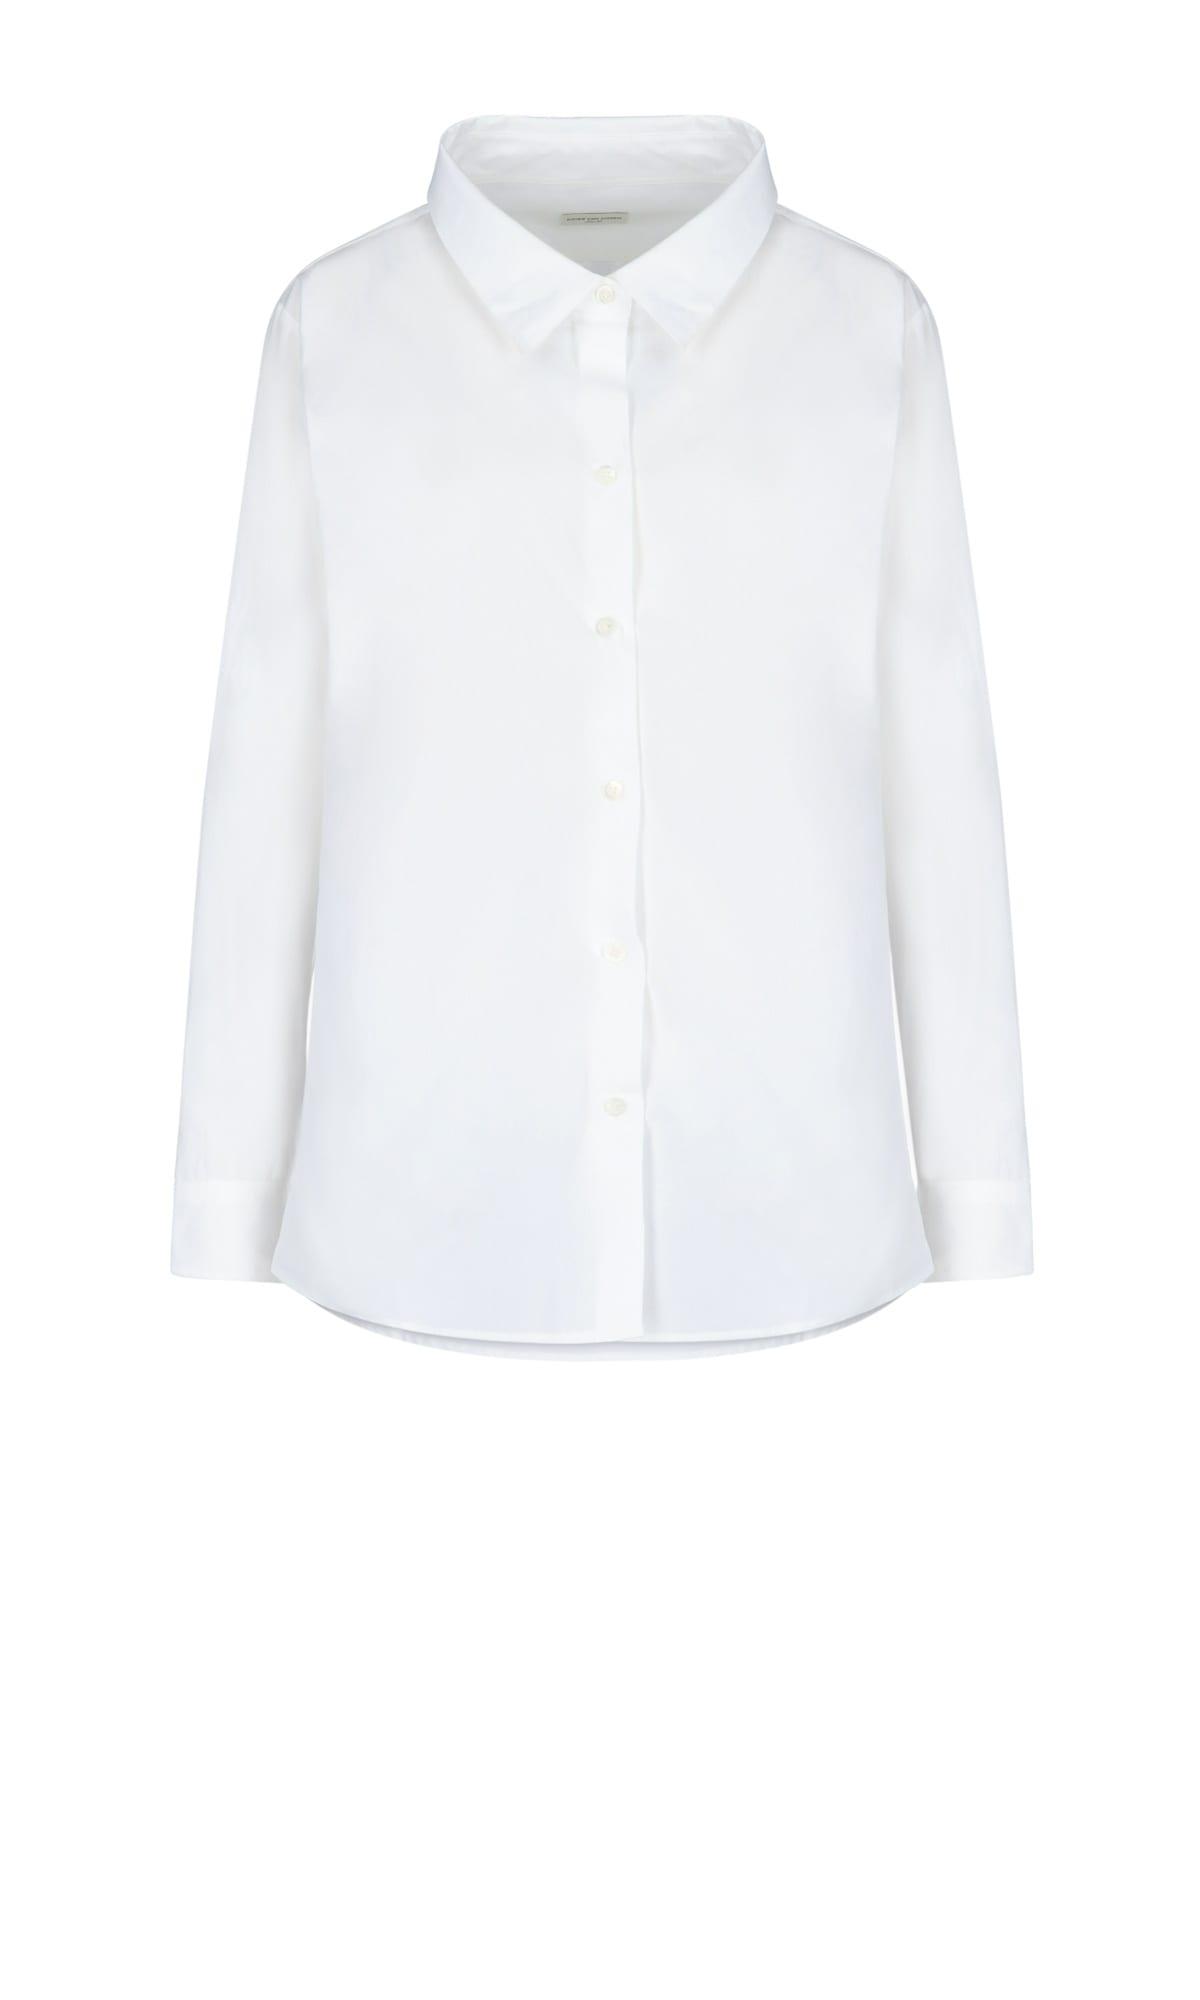 Dries Van Noten Shirts SHIRT